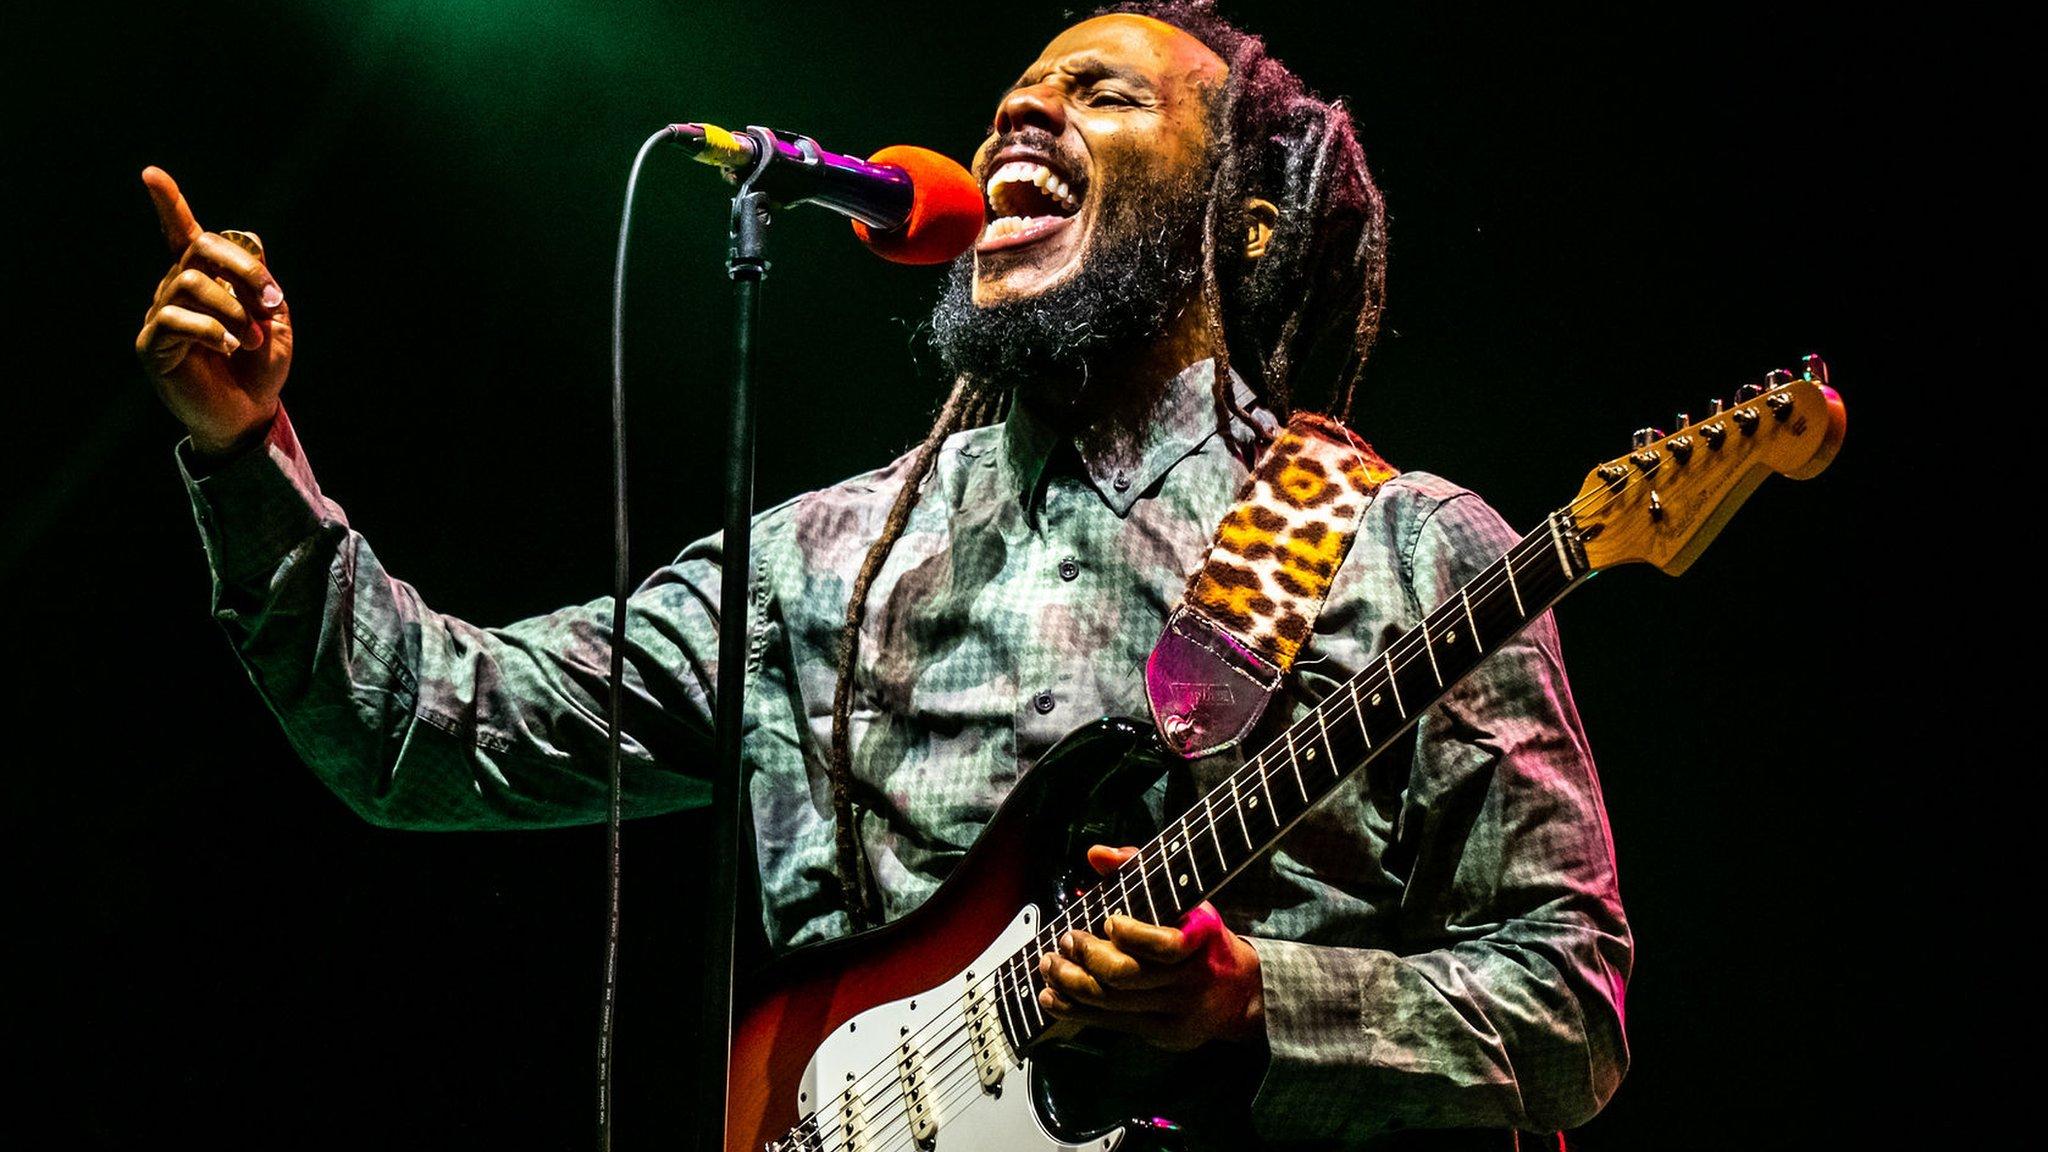 Ziggy Marley - New Songs, Playlists & Latest News - BBC Music